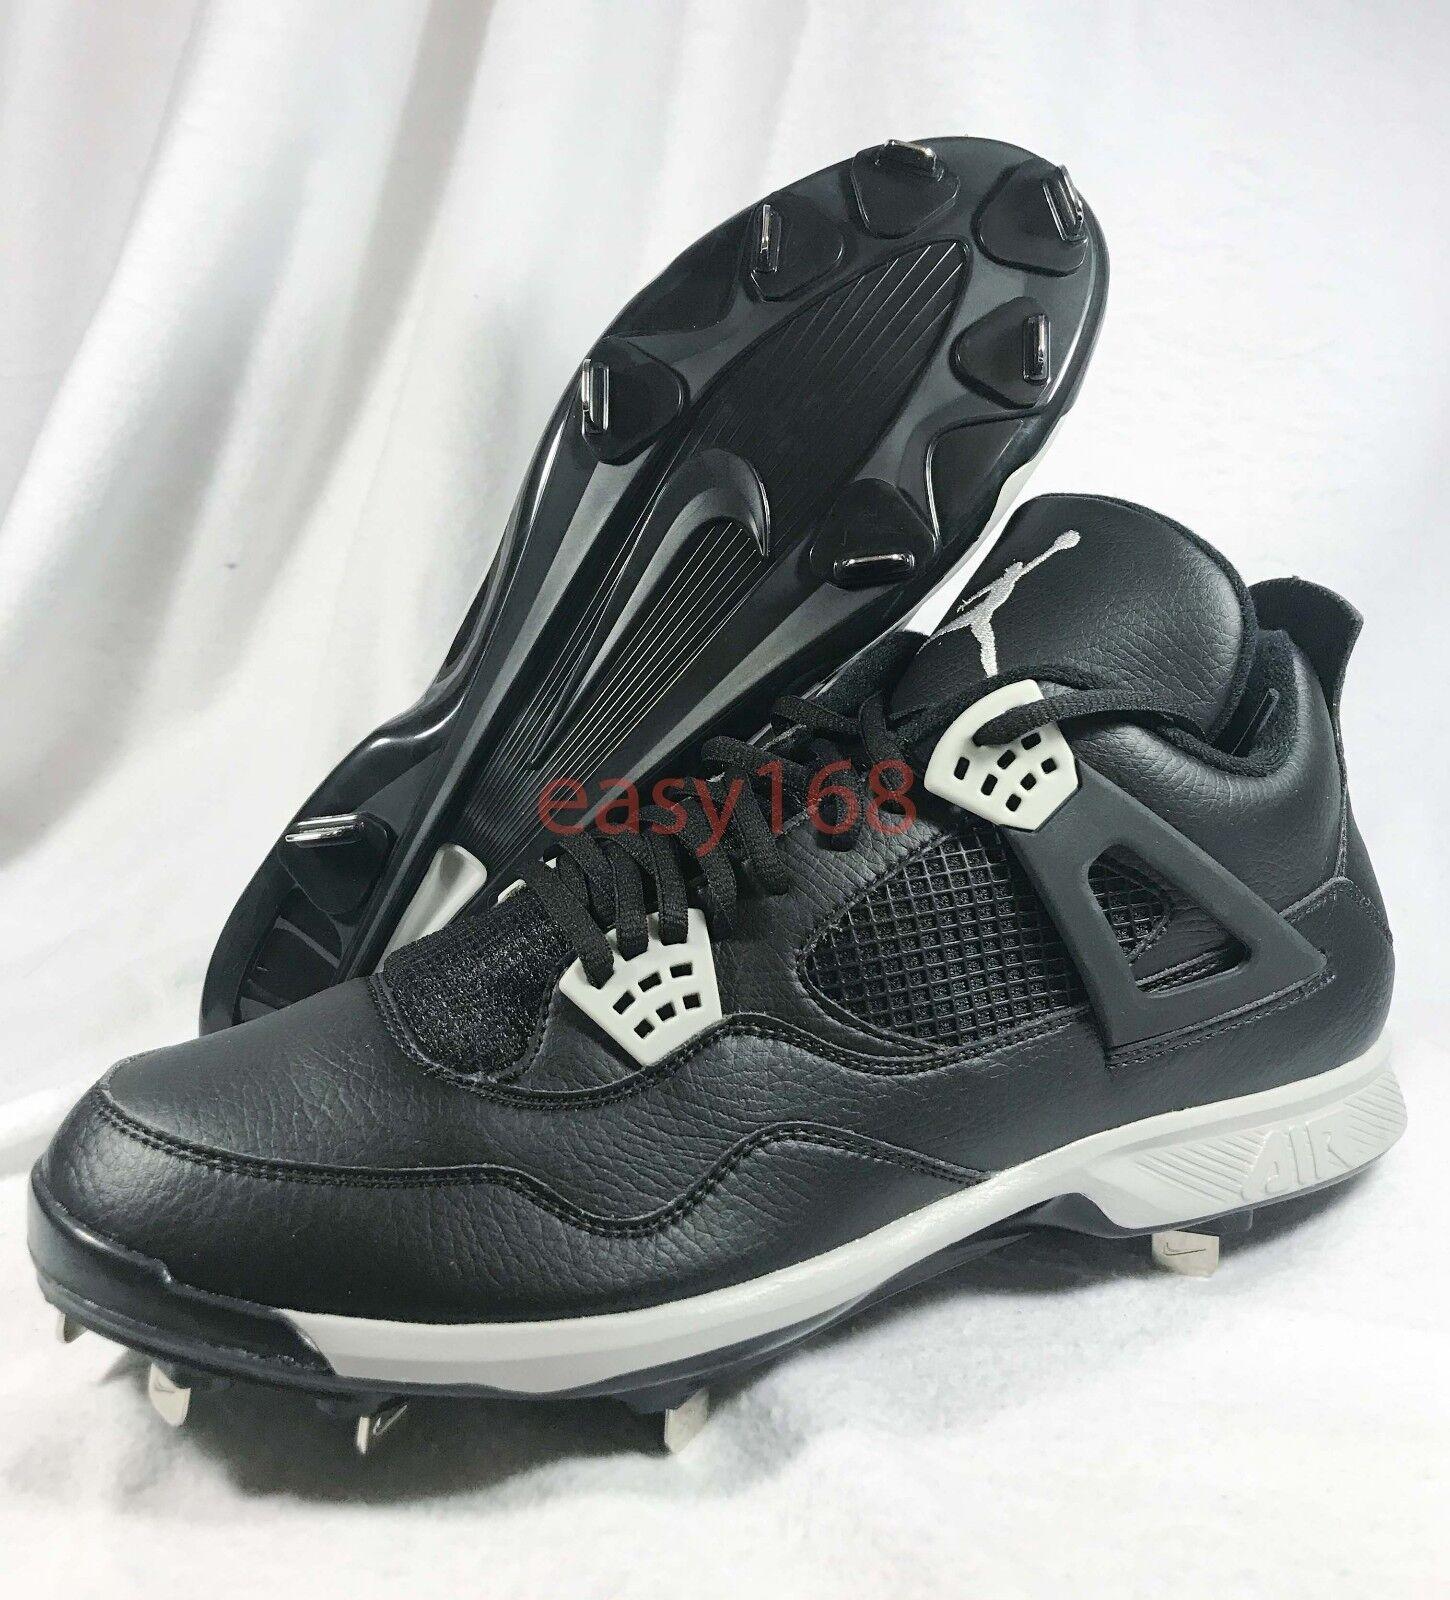 New Nike Air Jordan 4  Sz 13 Mens Metal Baseball Cleats Black Playoff Taxi